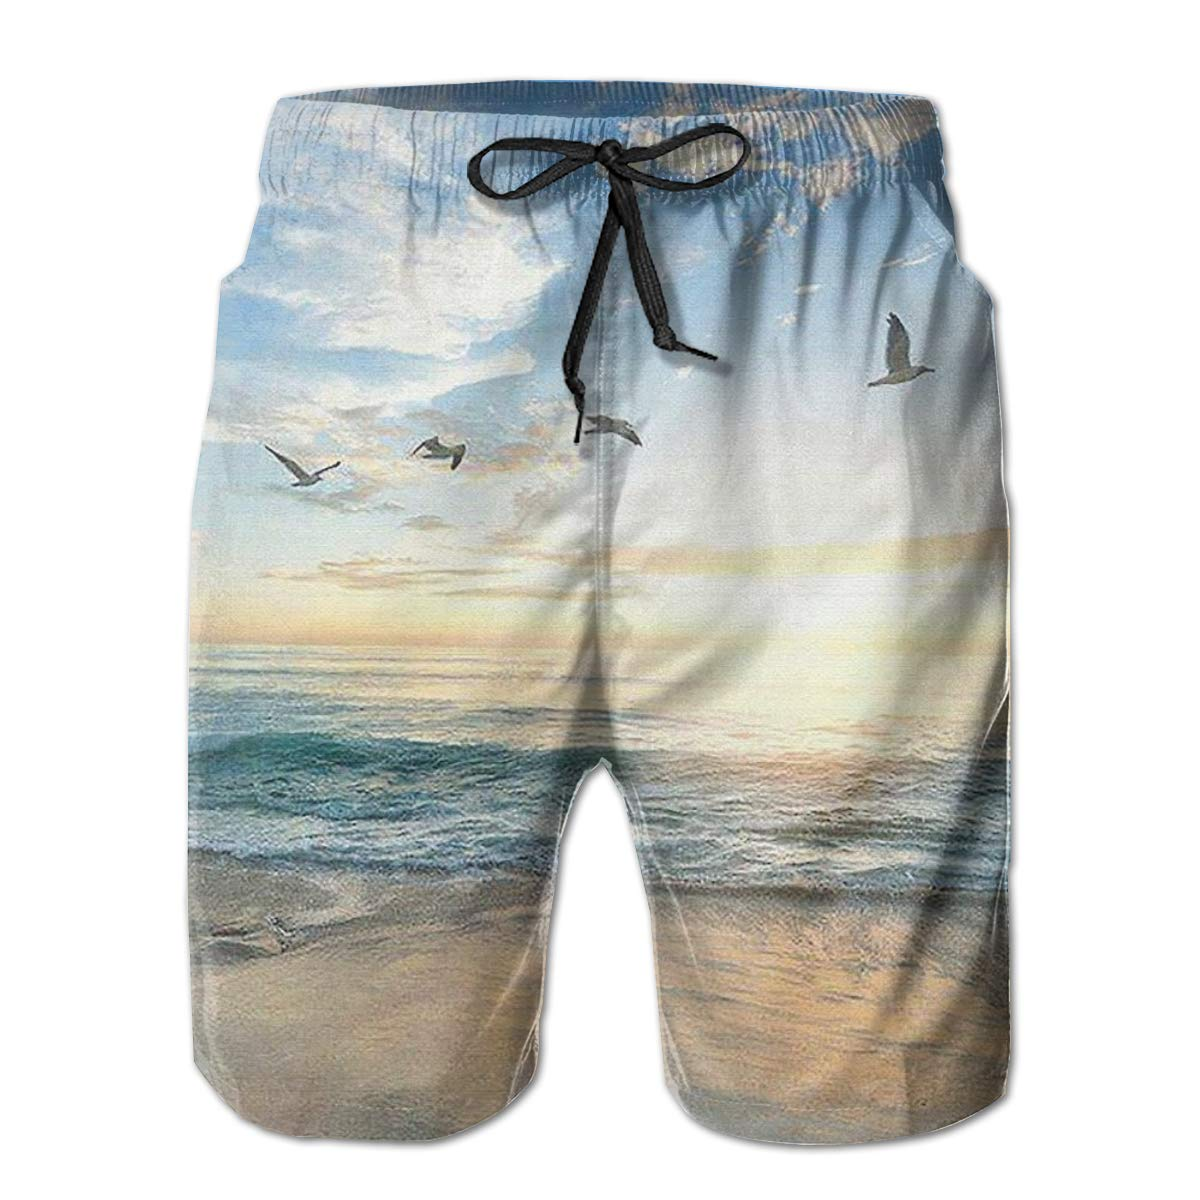 WWT Sea Mens Fashion Beach Shorts with Mesh Lining//Side Pockets